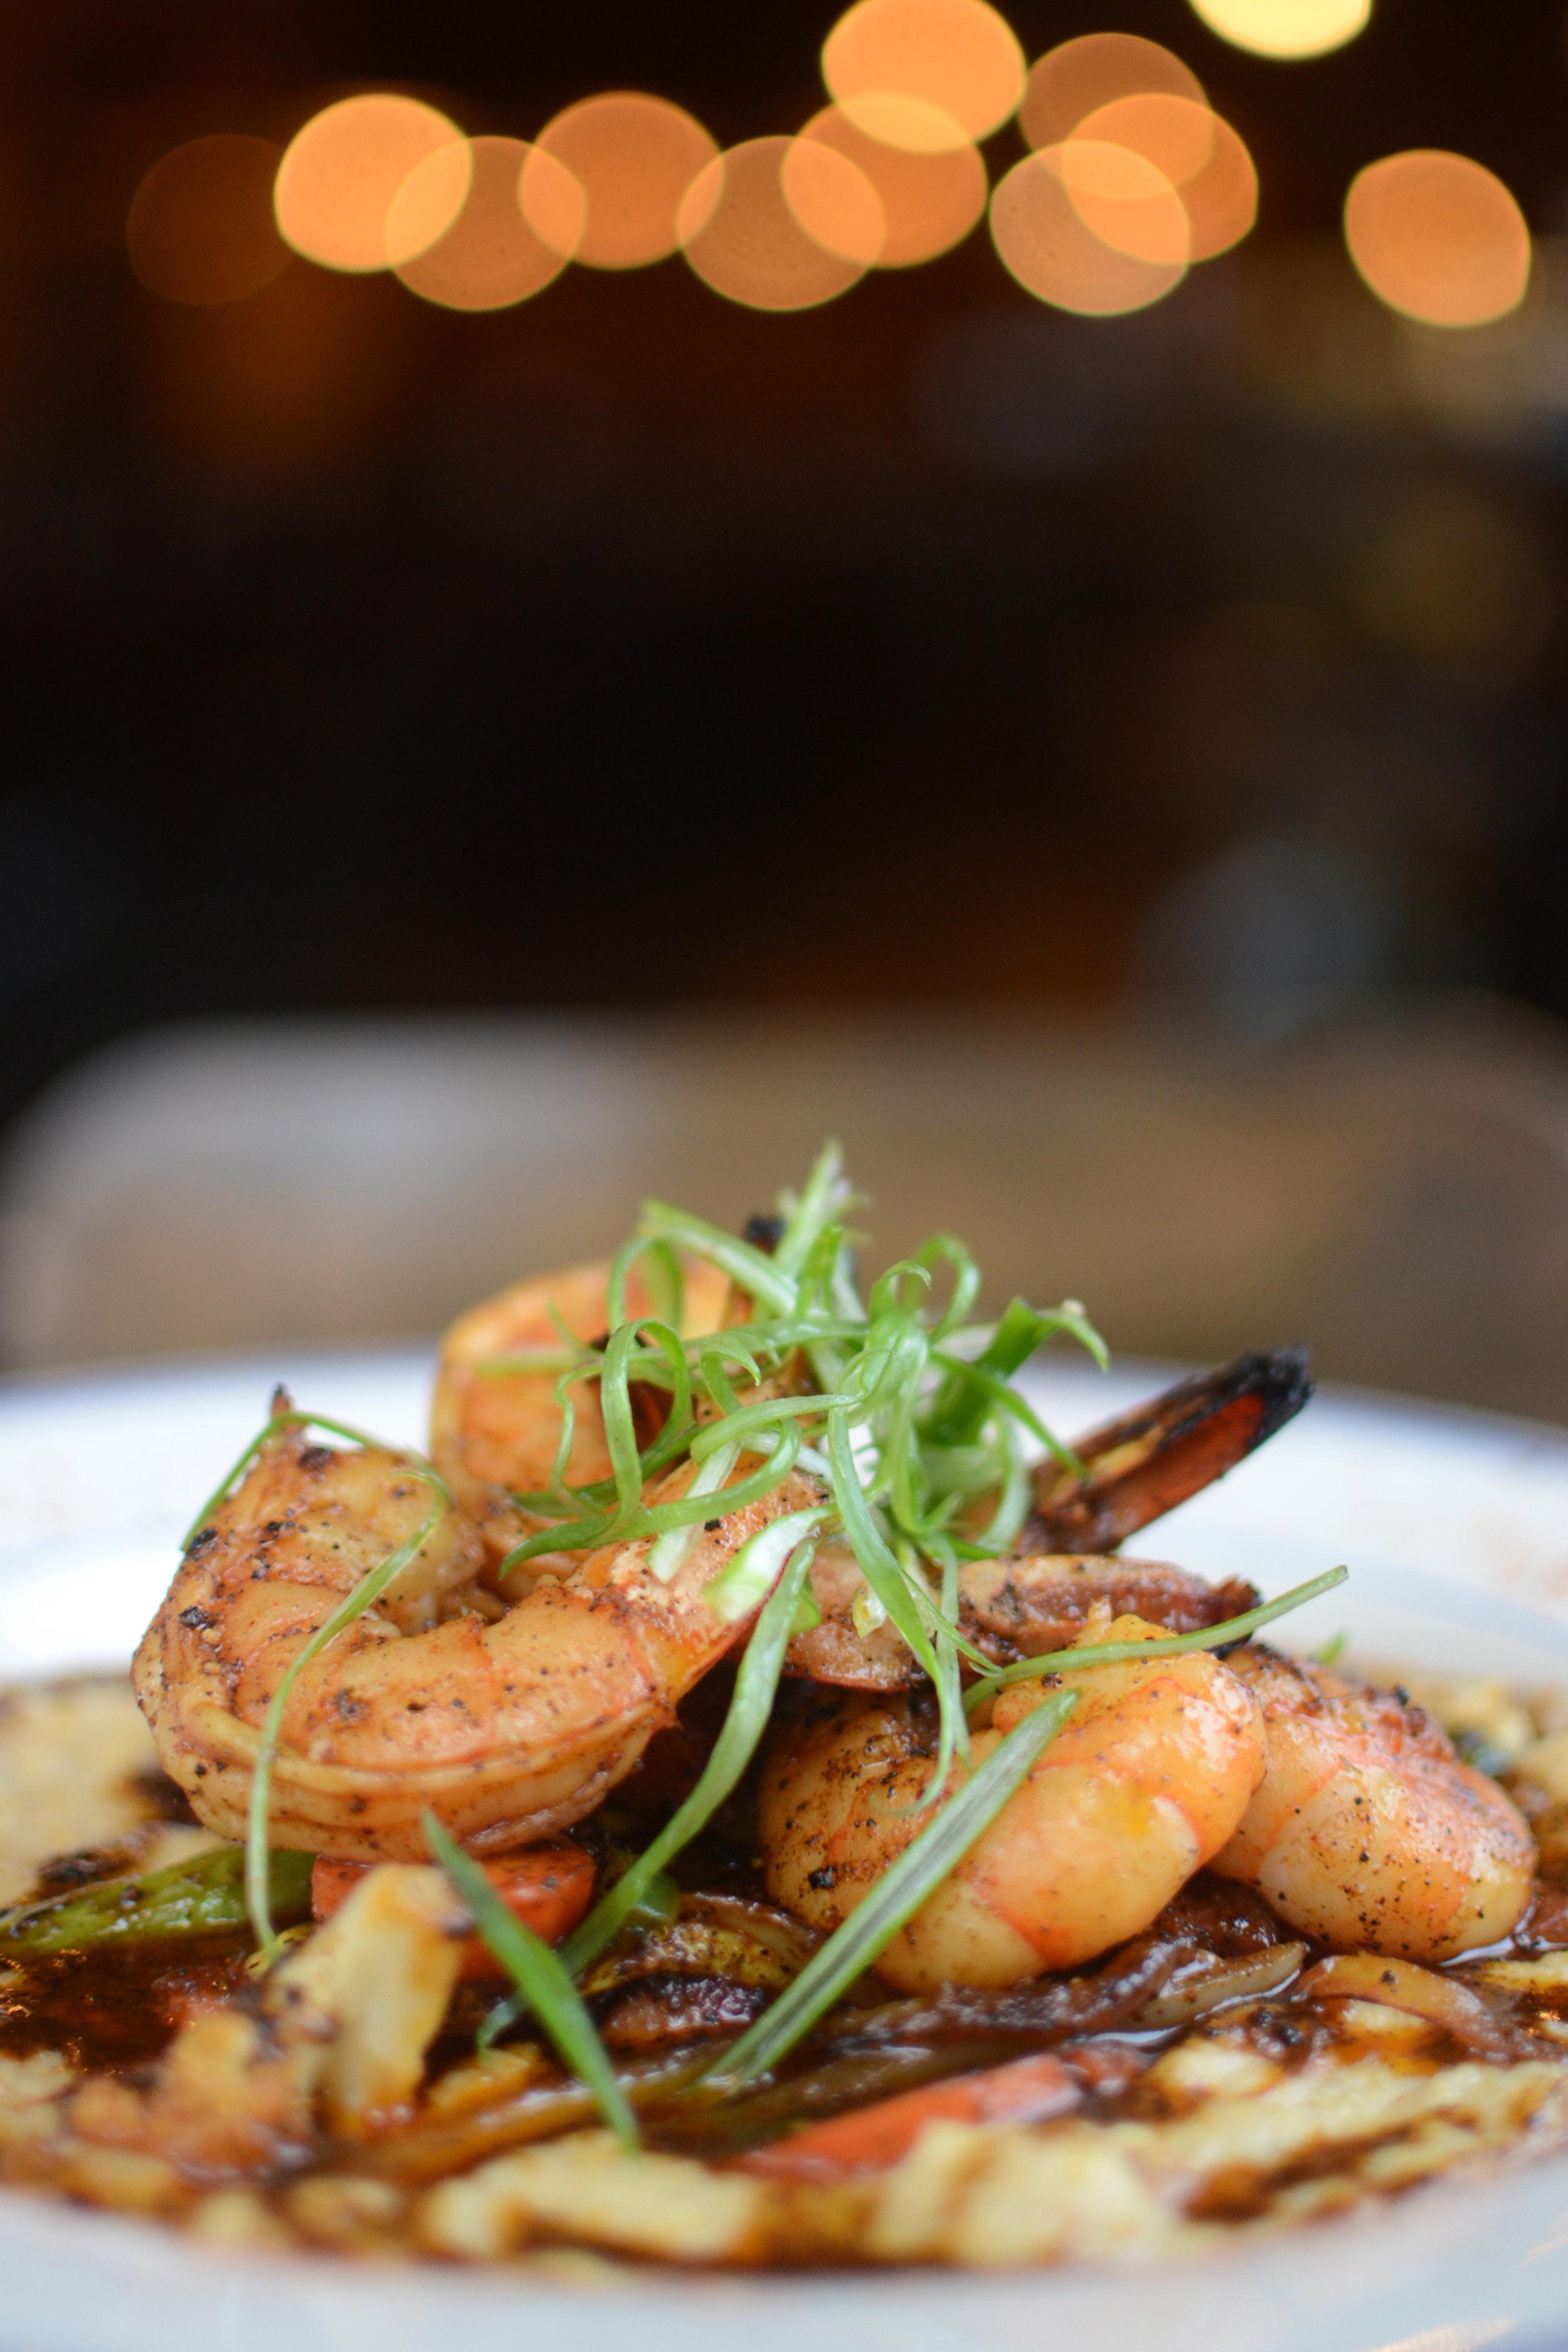 shrimp-and-grits-casper-fry